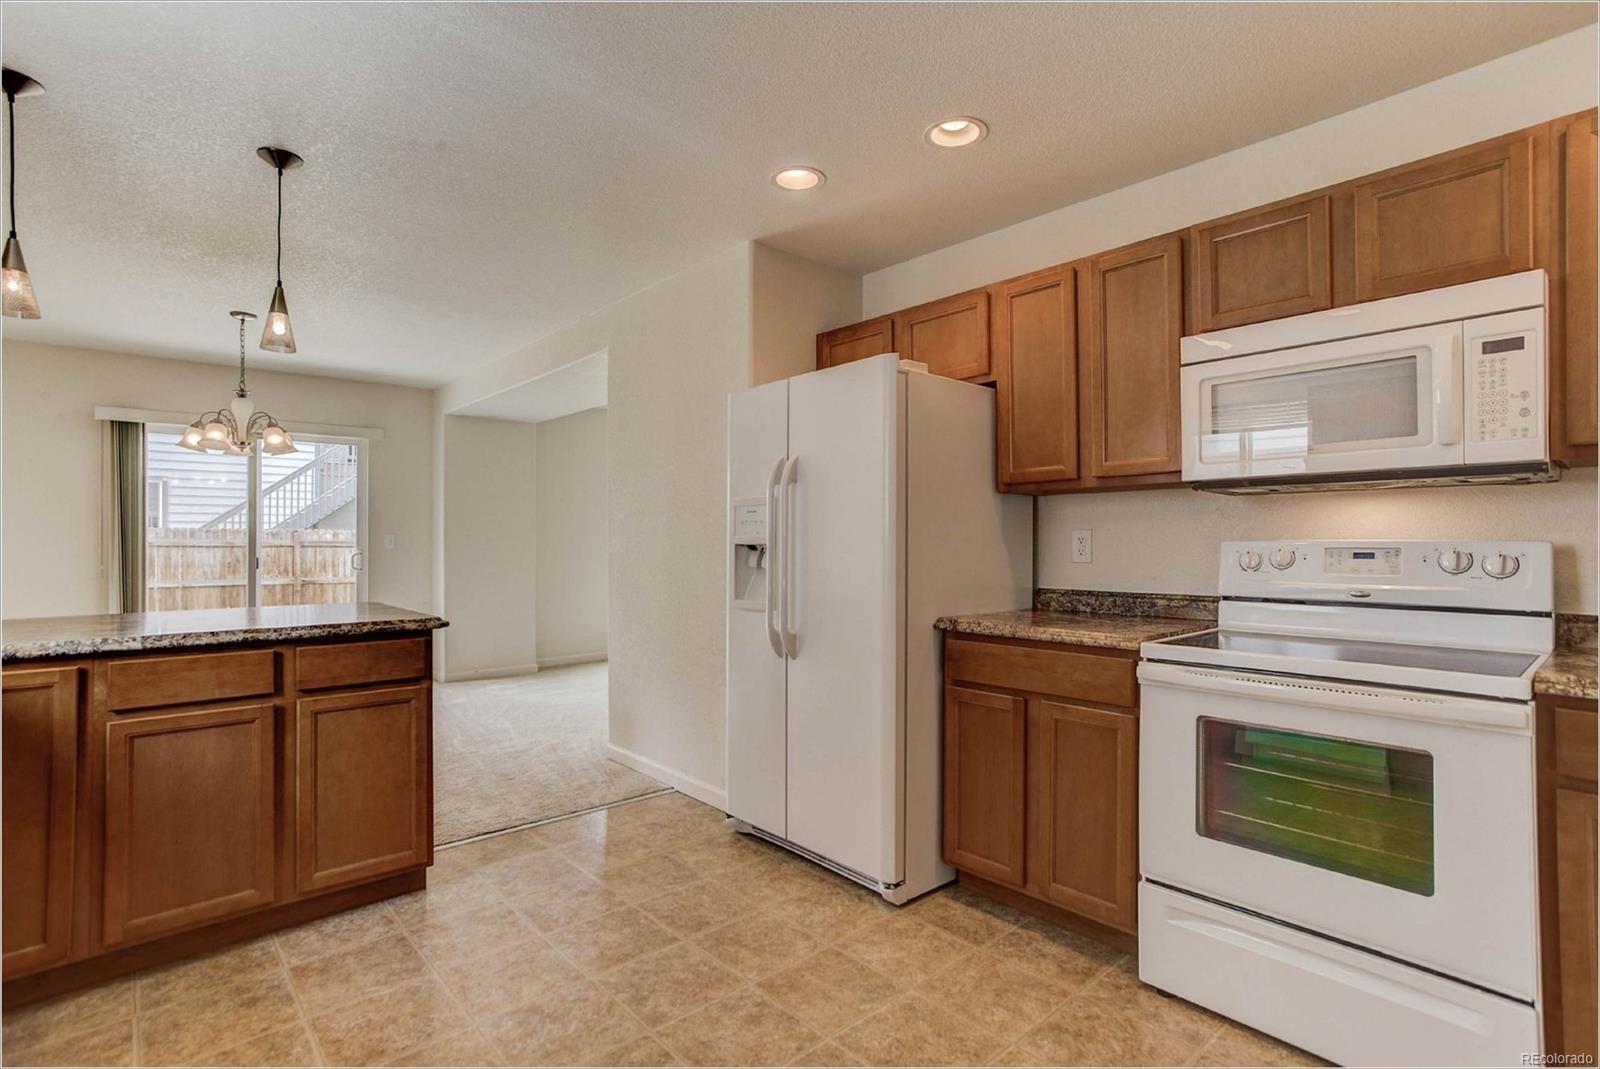 MLS# 9061505 - 8545  Tejon Street, Federal Heights, CO 80260